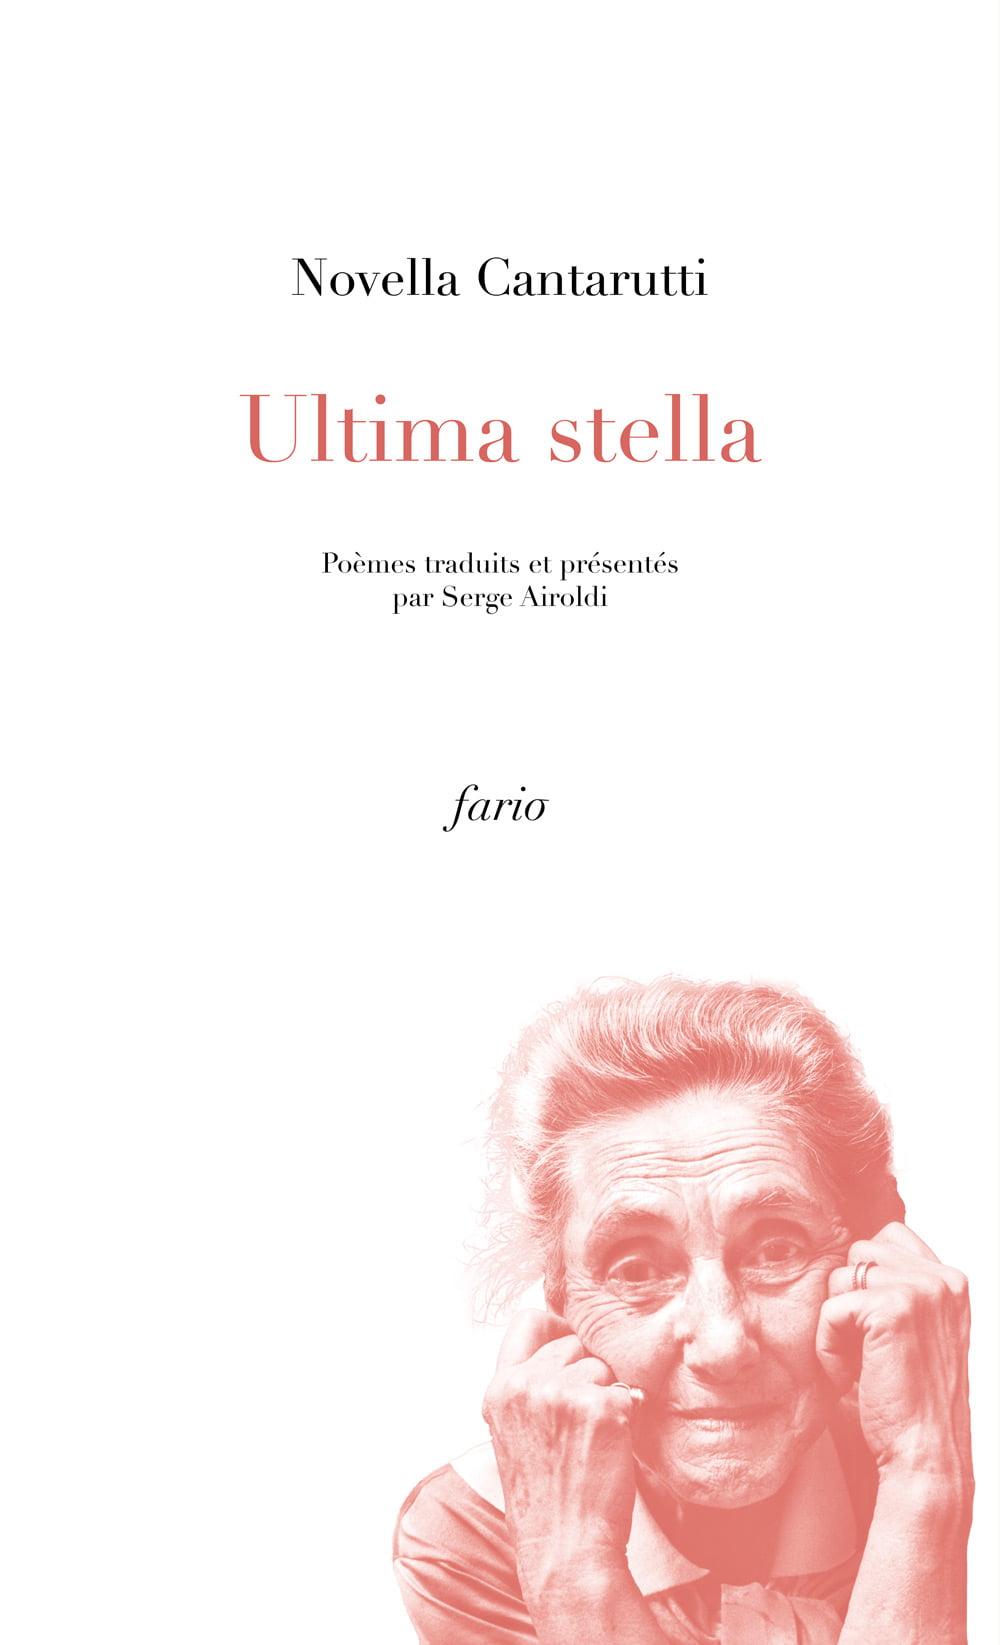 N. Cantarutti, Ultima stella